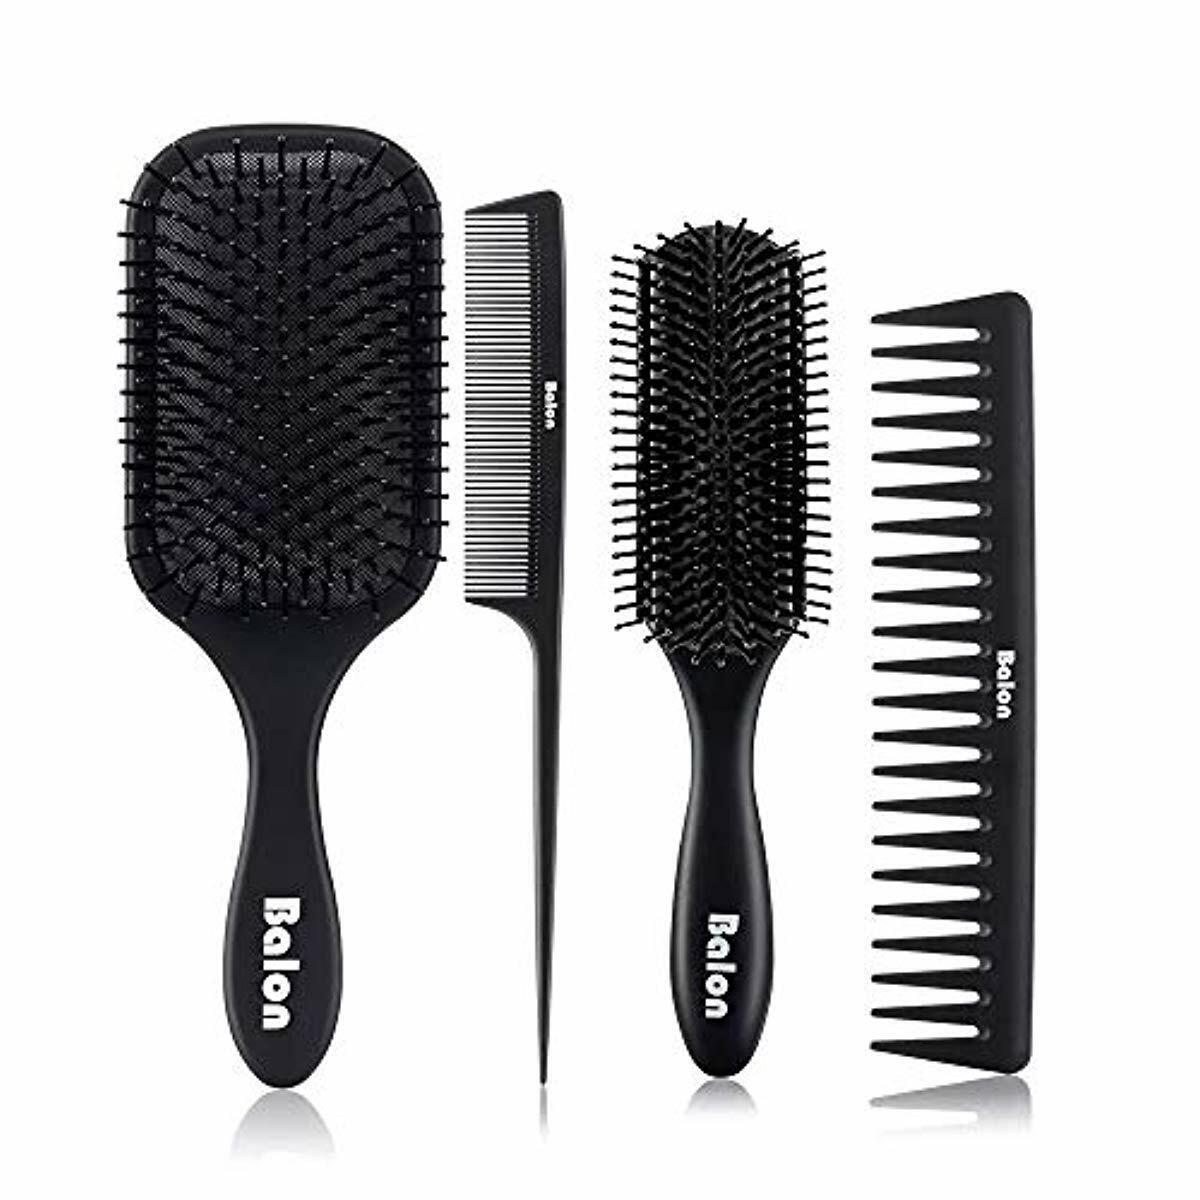 4Pcs Paddle Hair Brush, Detangling Brush and Hair Comb Set f